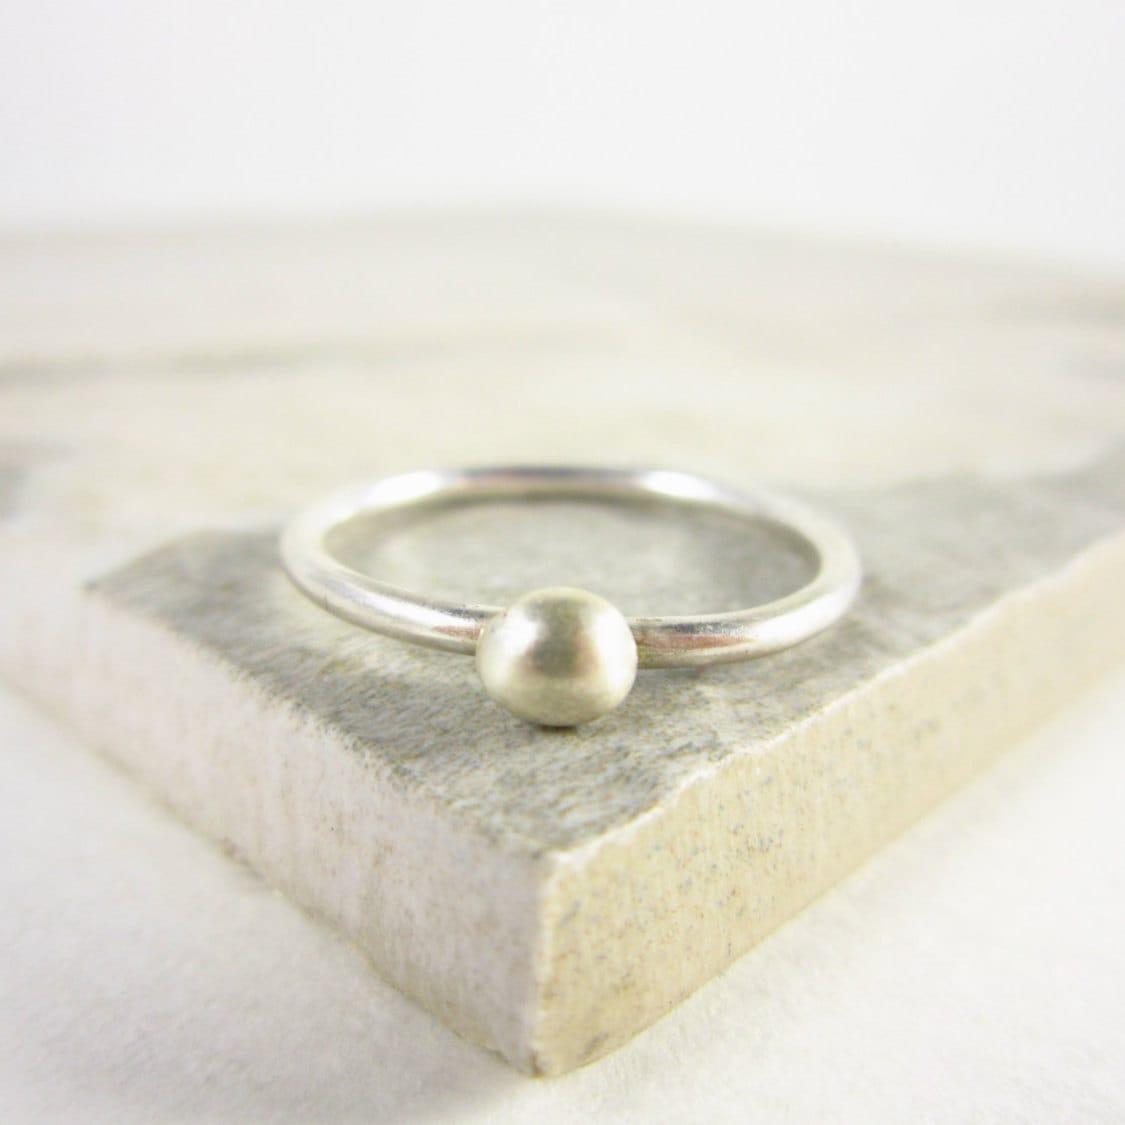 silver stacking rings simple ring pebble rings rustic